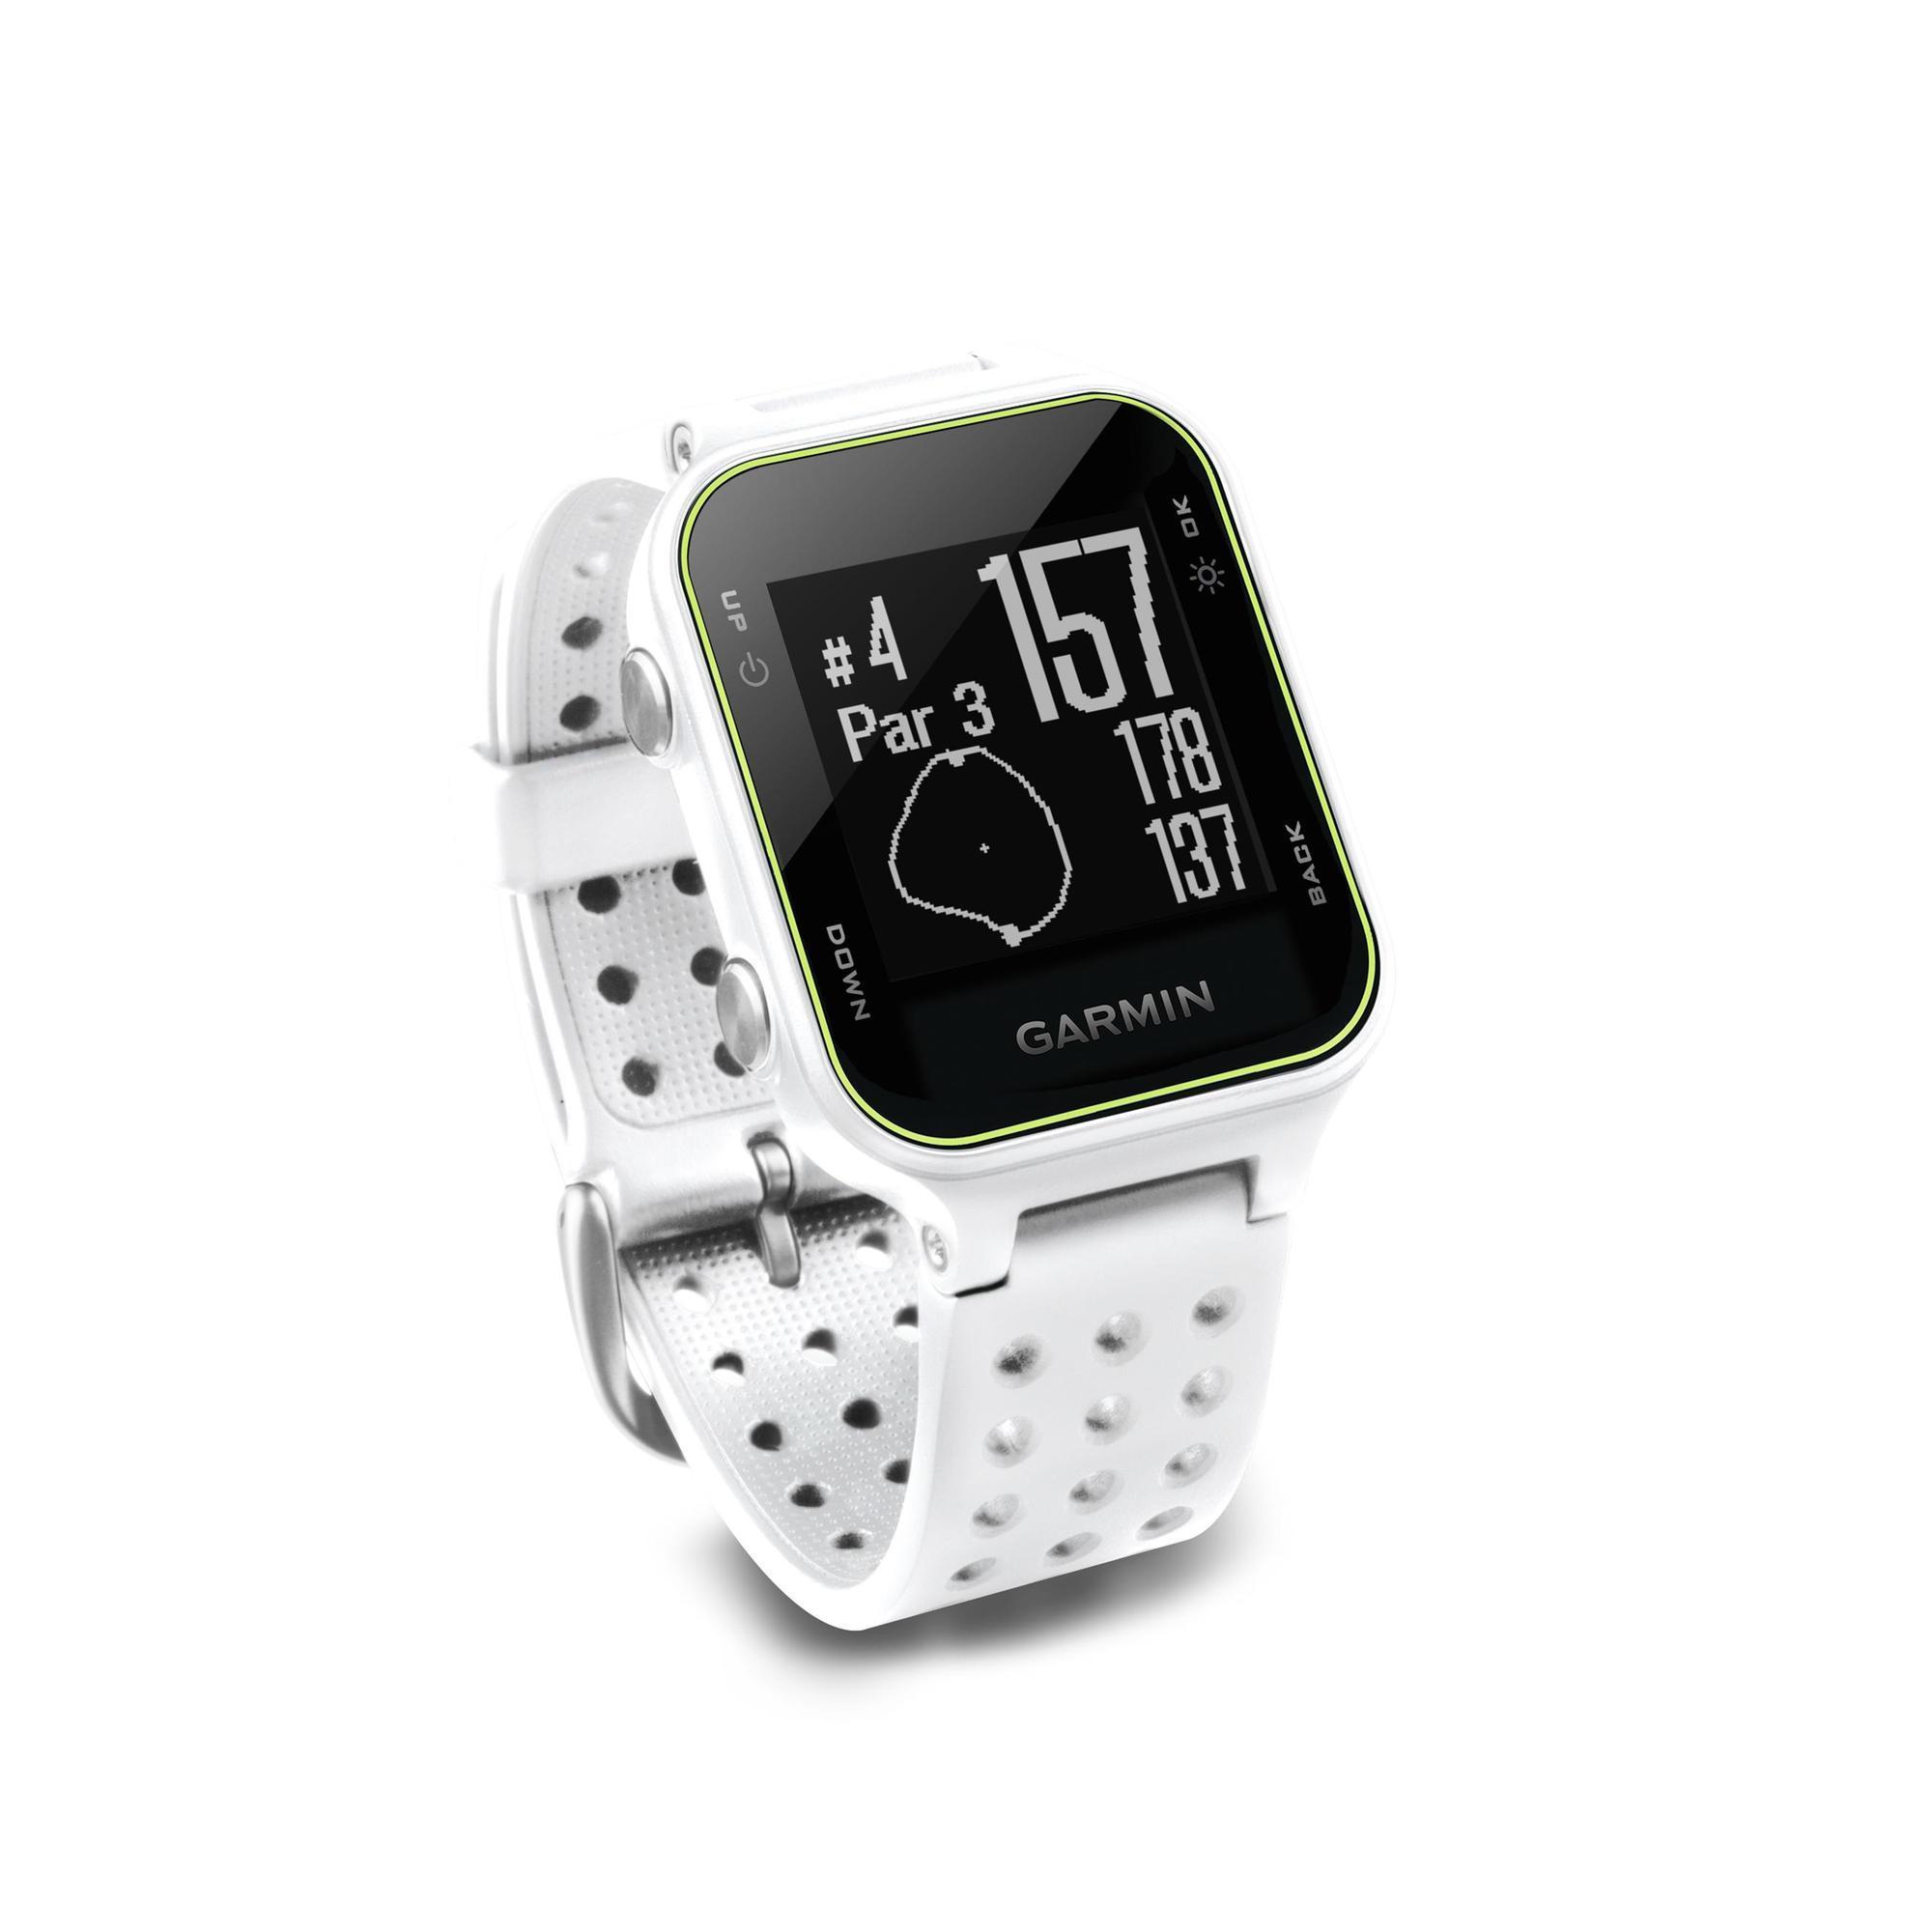 75757f2d6b76 Comprar Relojes Gps Deportivos online